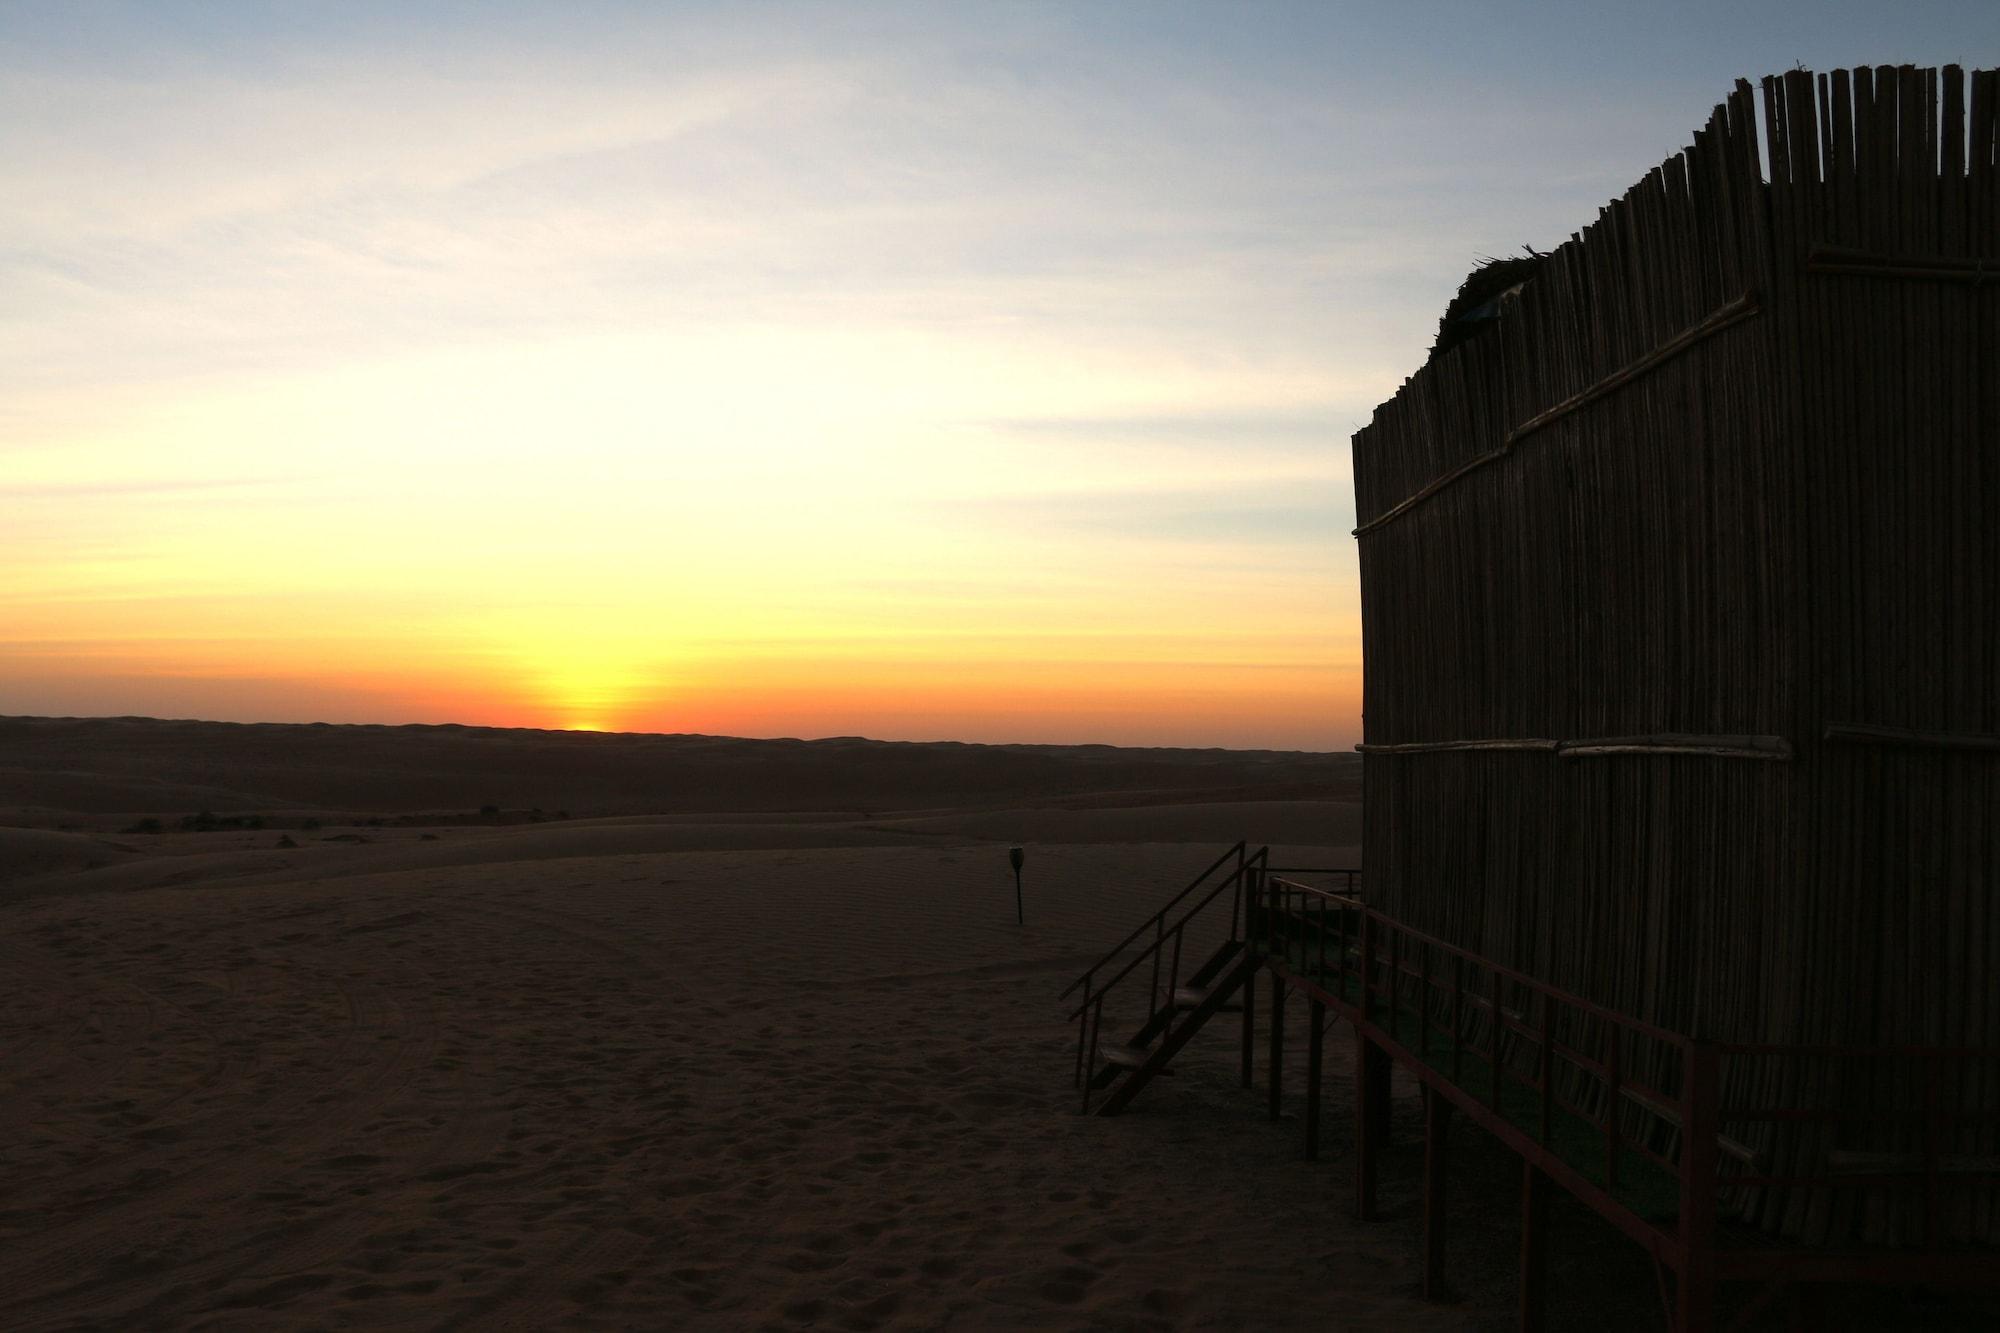 Starwatching Private Camp - Desert Private Camp, Biddiya